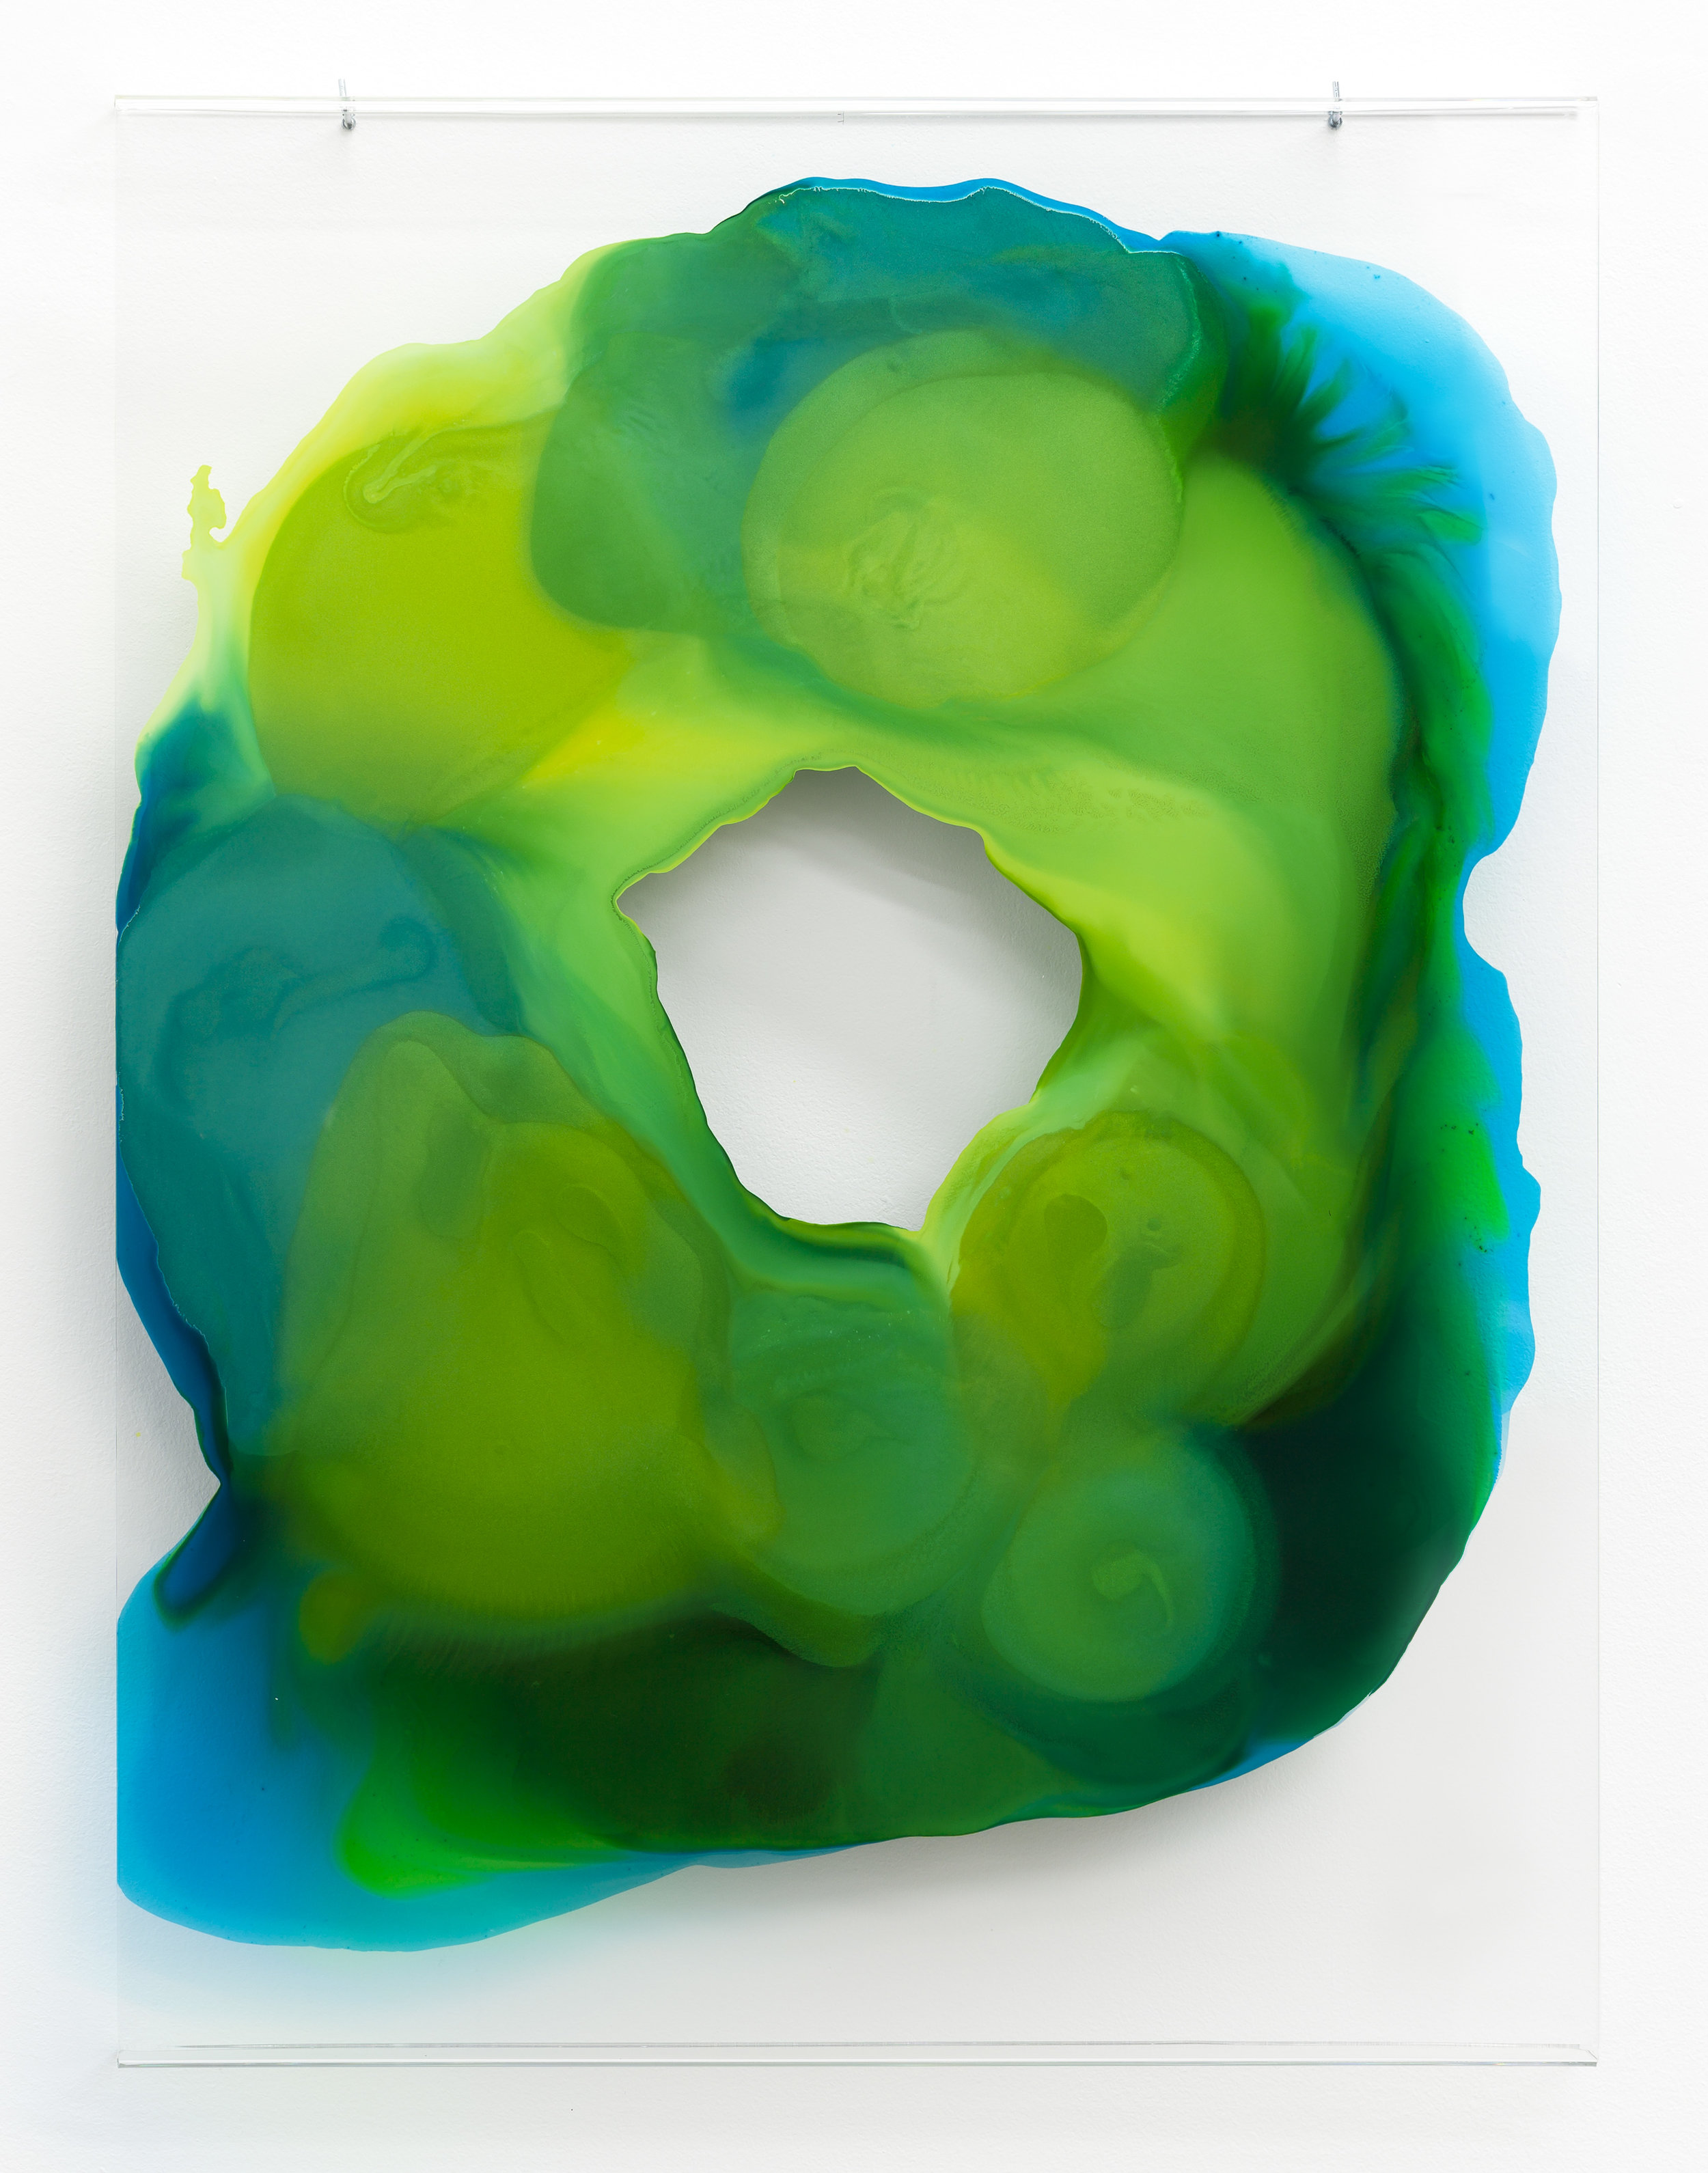 Lime halo - Susie Leahy Raleigh, 80x60cm.jpg